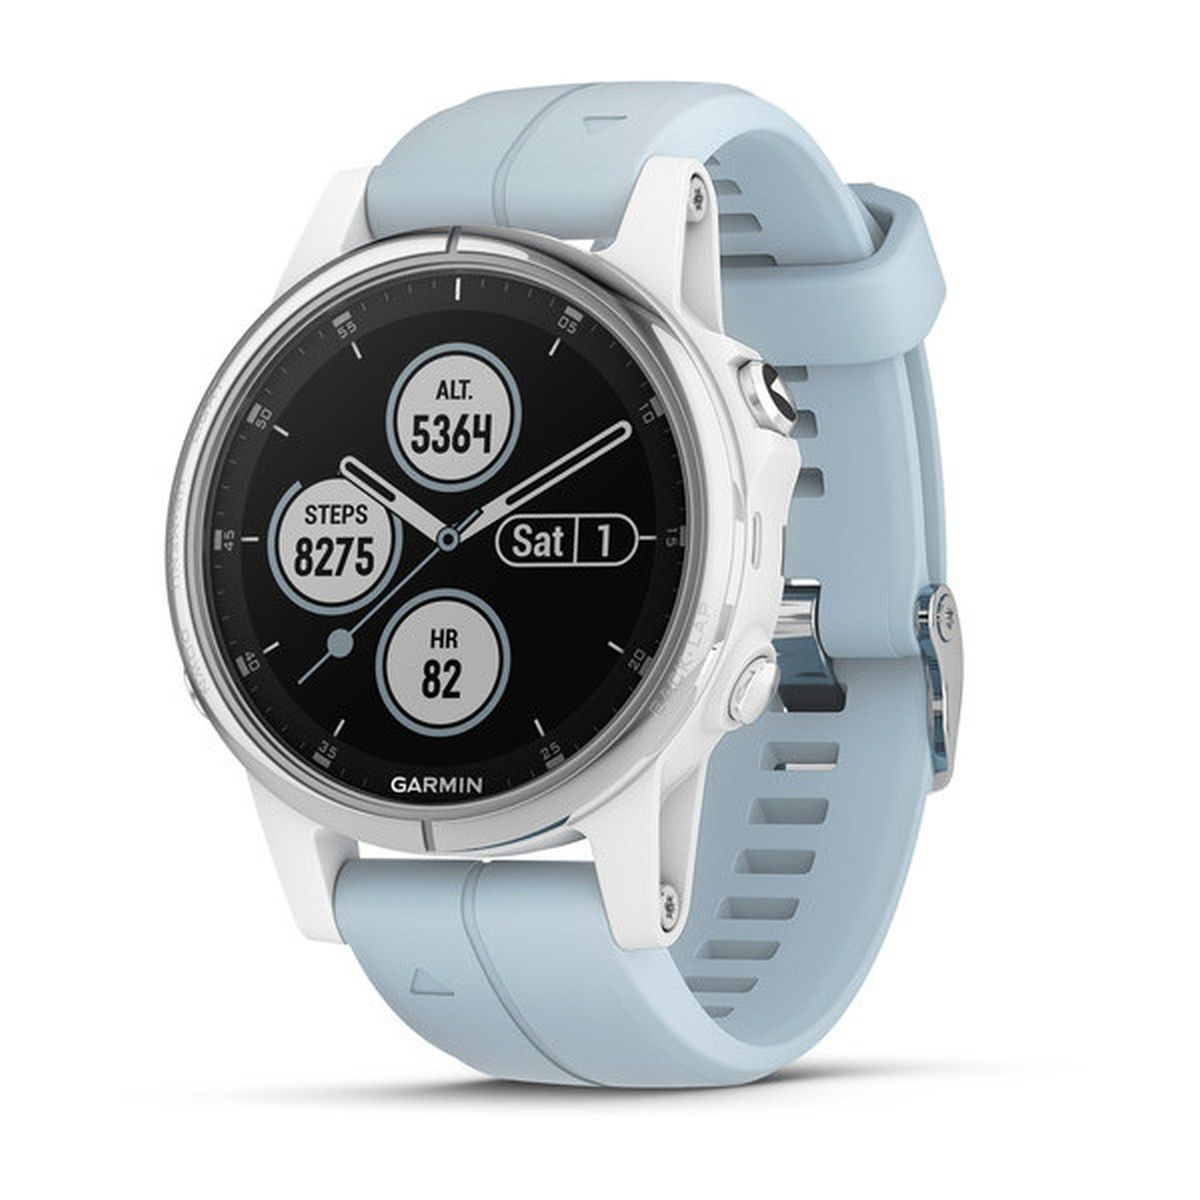 Garmin Fenix 5S Plus White GPS Watch